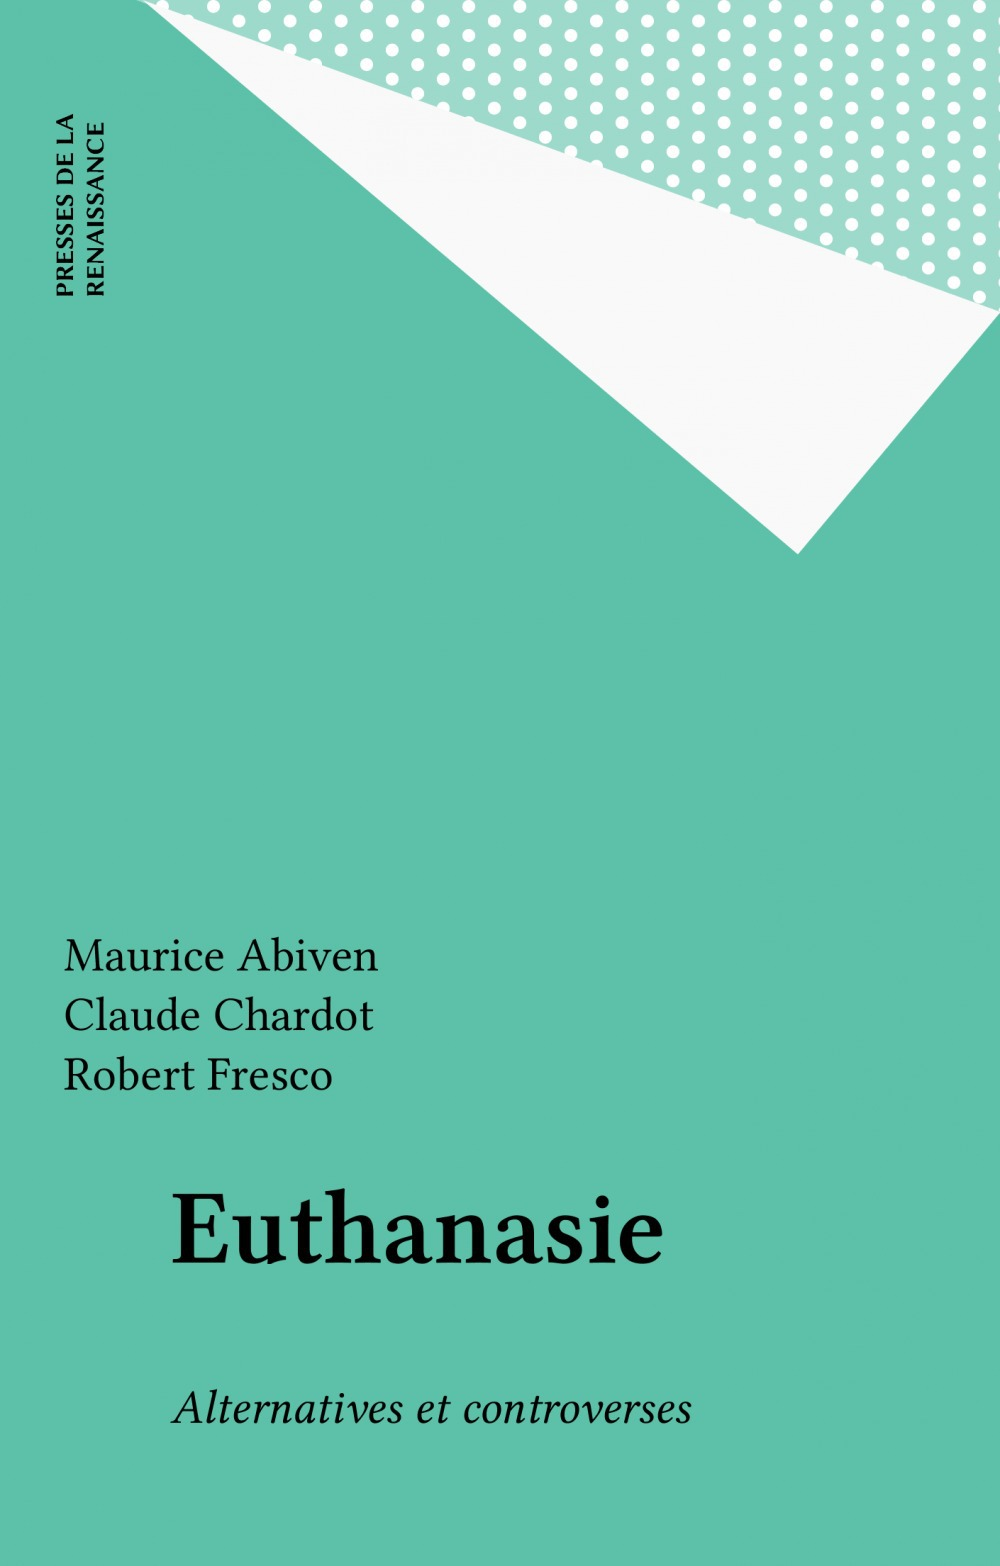 L'euthanasie ; alternatives et controverses